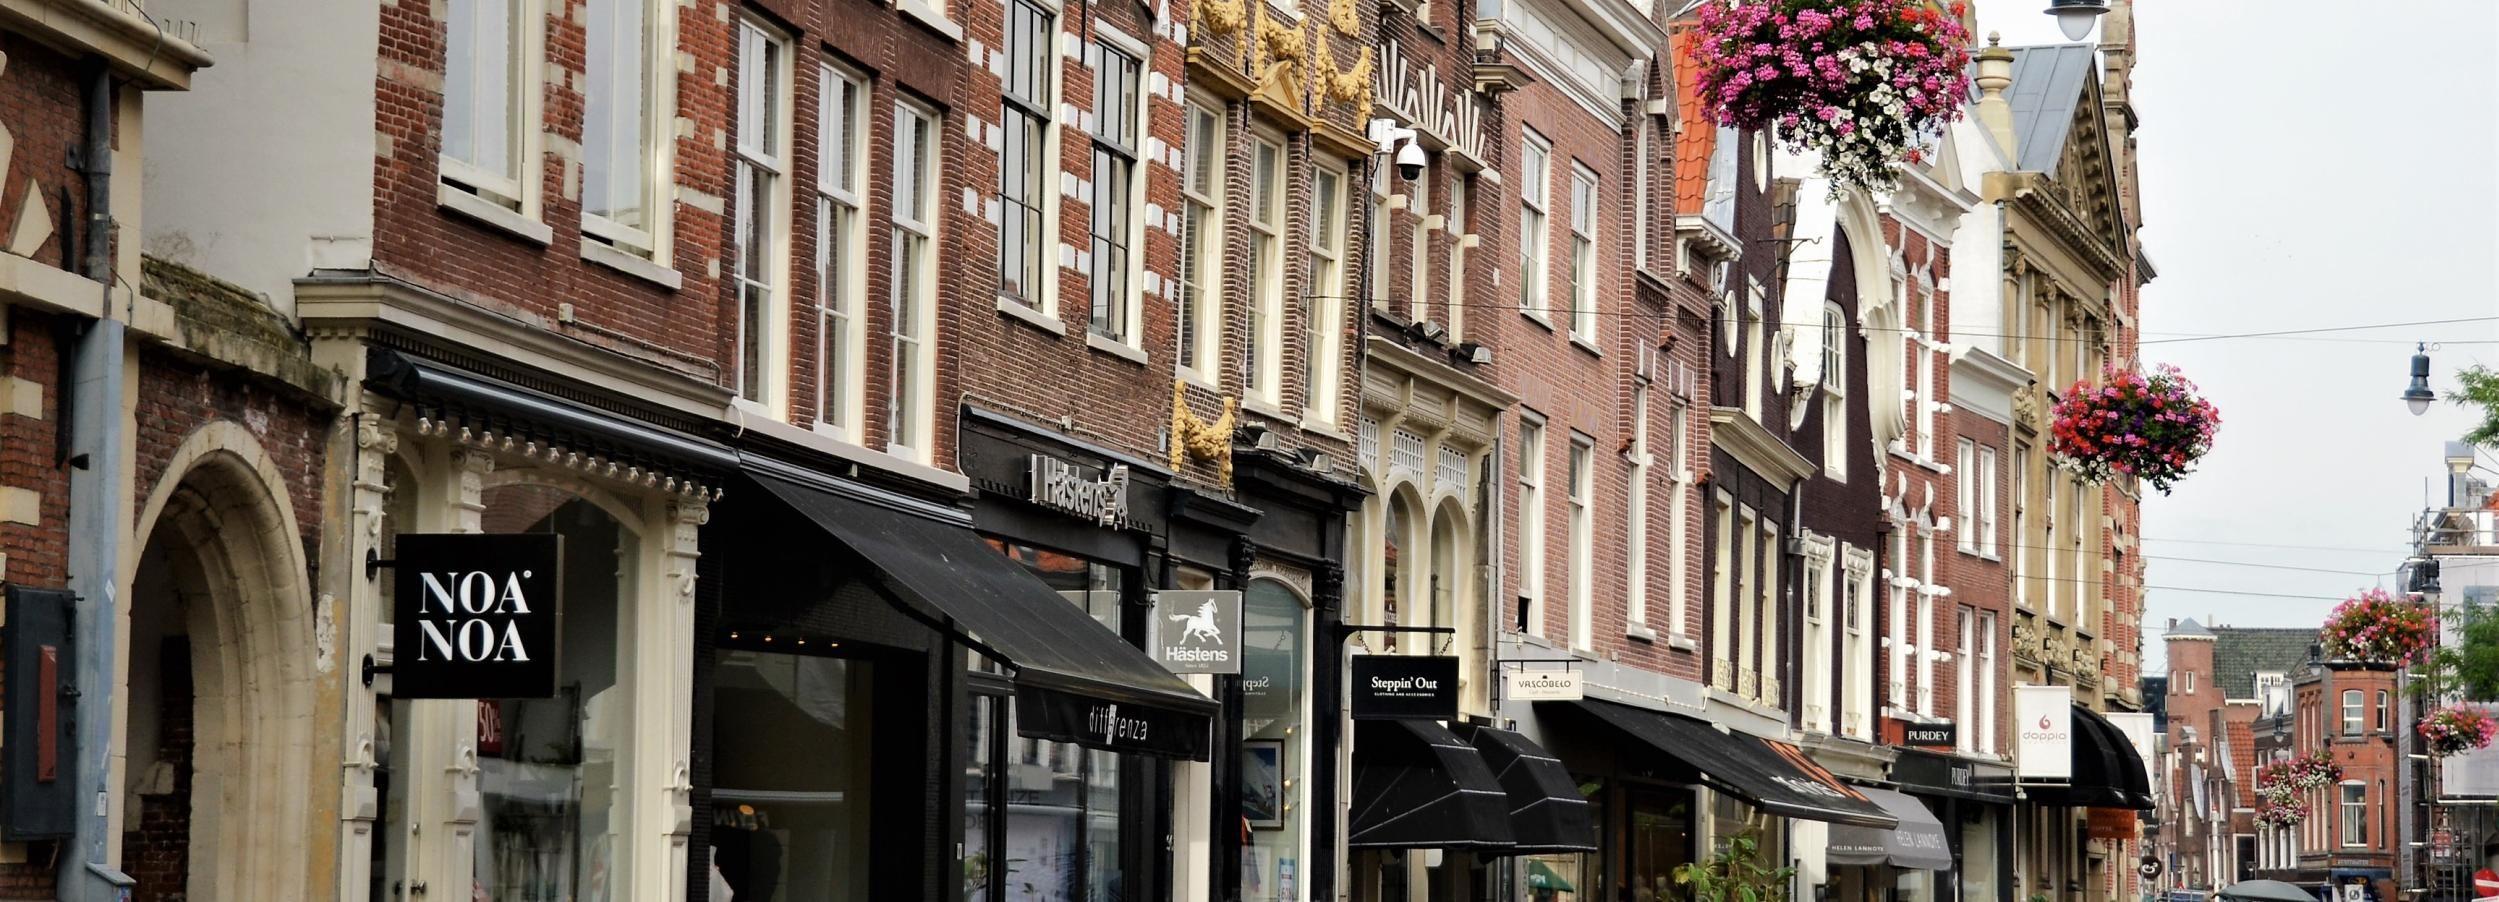 Haarlem: Interactive City Discovery Adventure